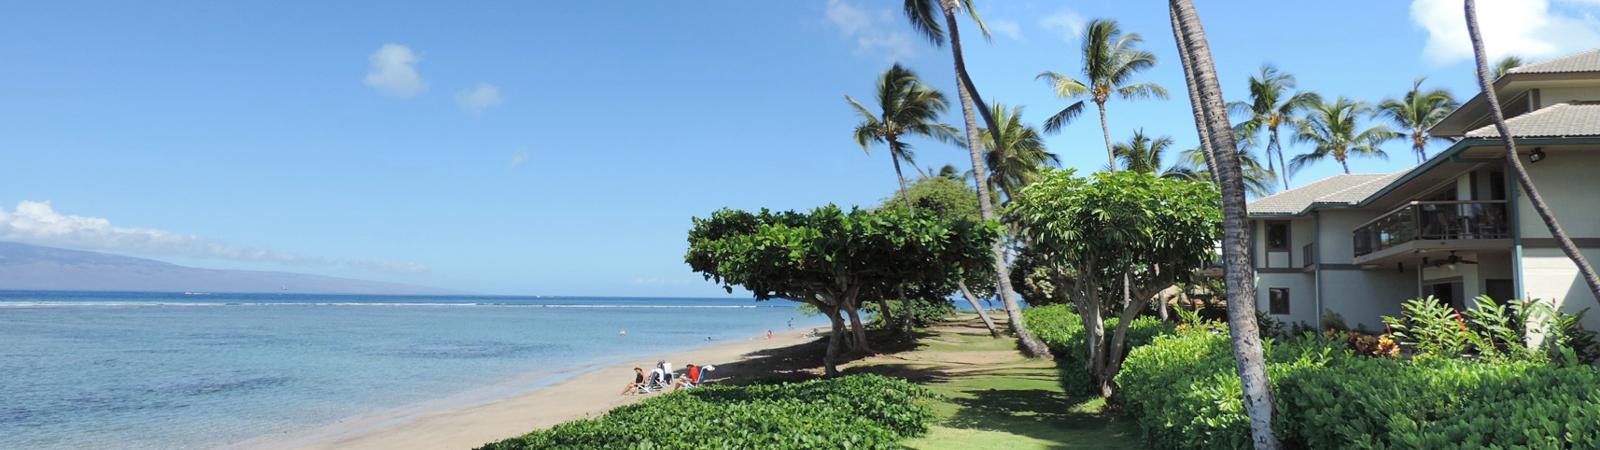 DRHawaii_Puunoa BeachEstates_Exterior (14)